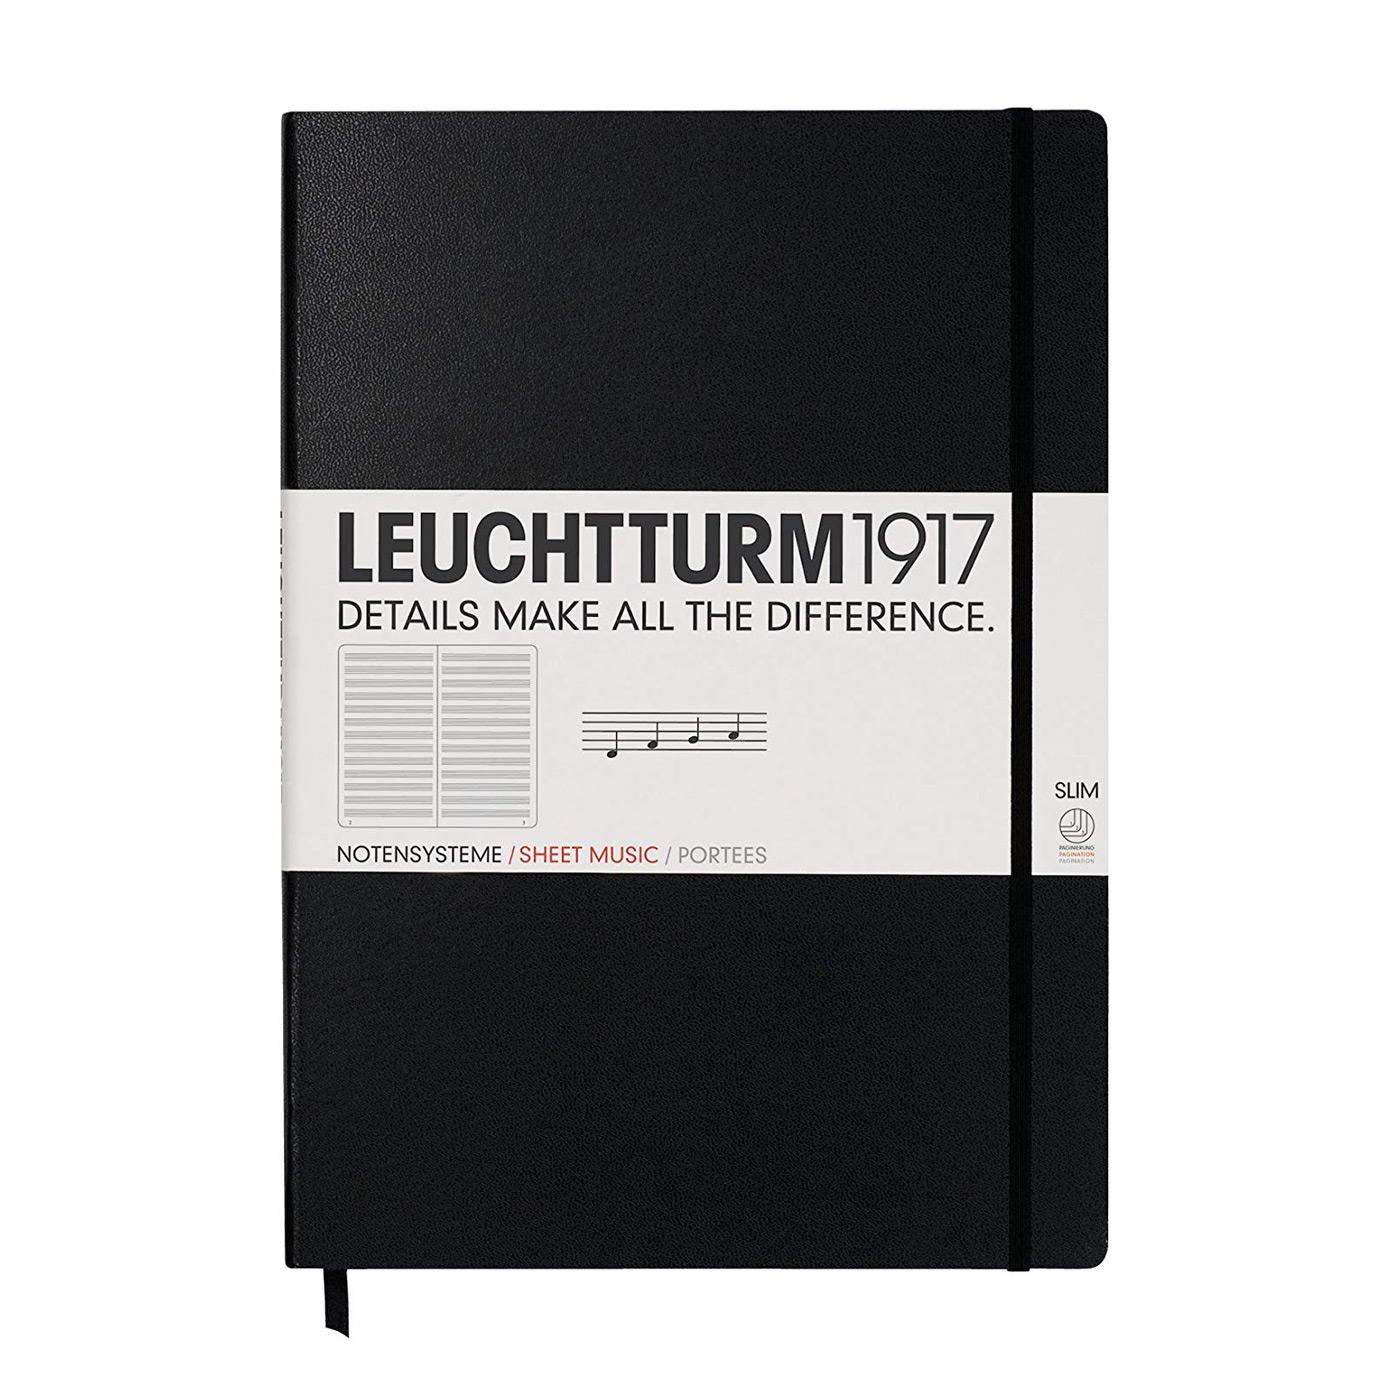 Leuchtturm 1917 Staved Master Slim A4+ Hardcover Notebook